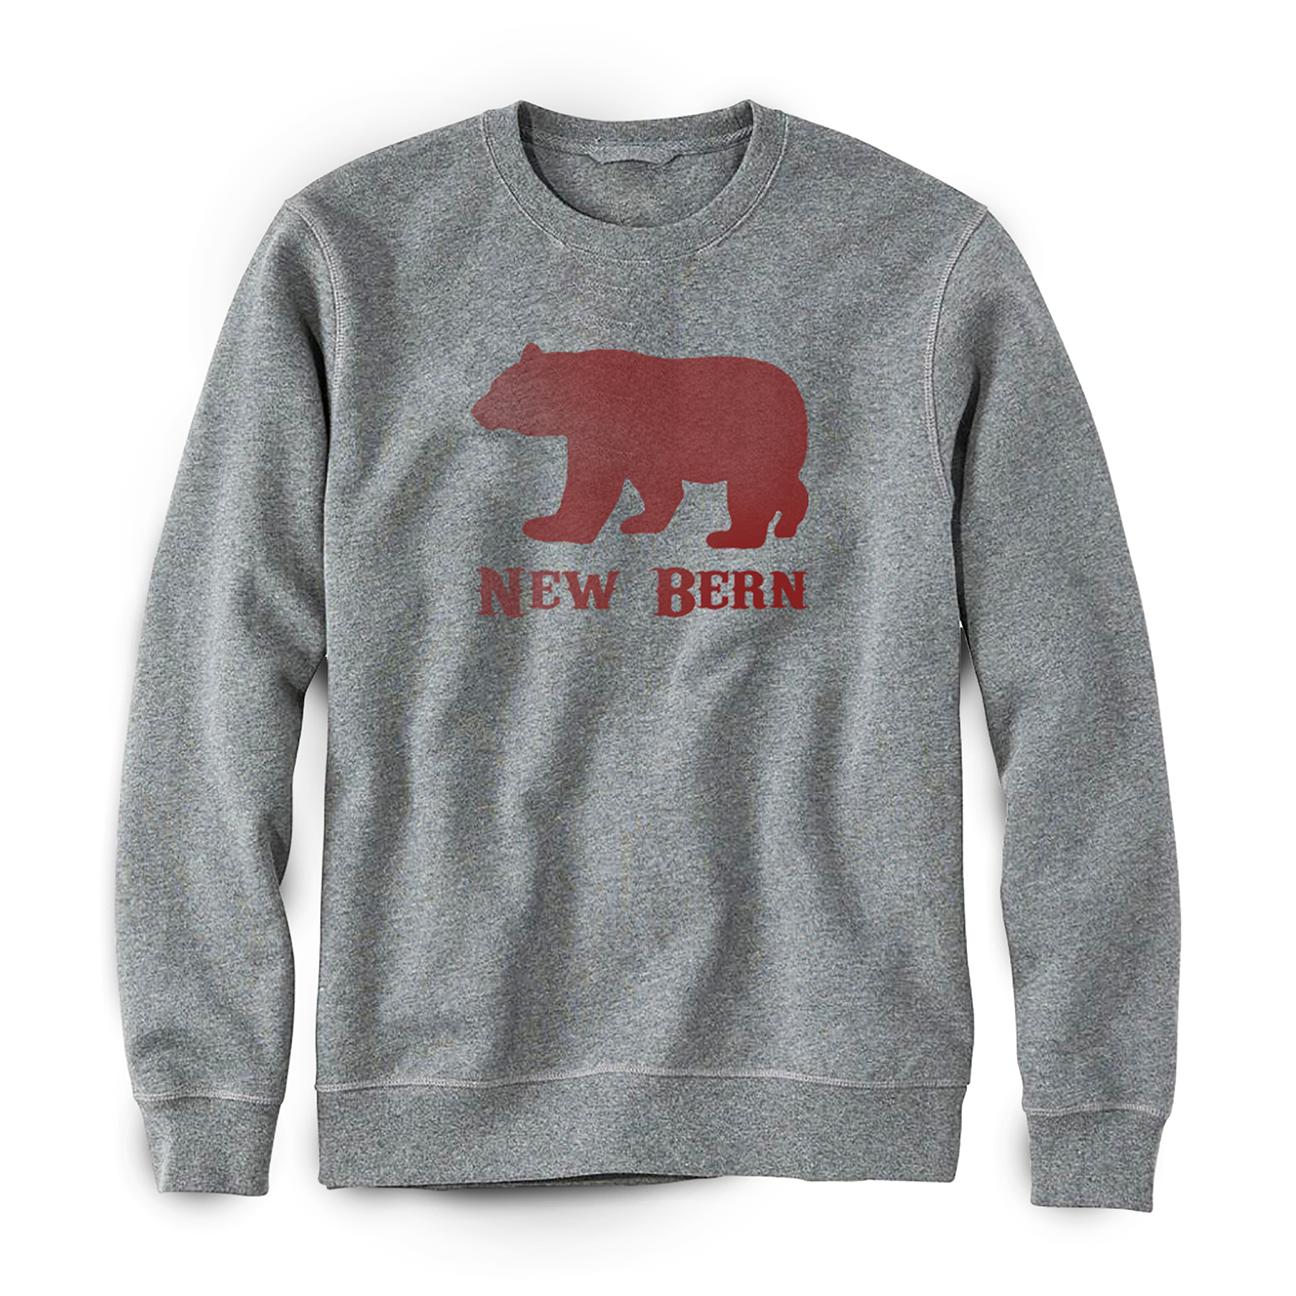 New Bern Simple Bear Crew Sweatshirt, Grey-1